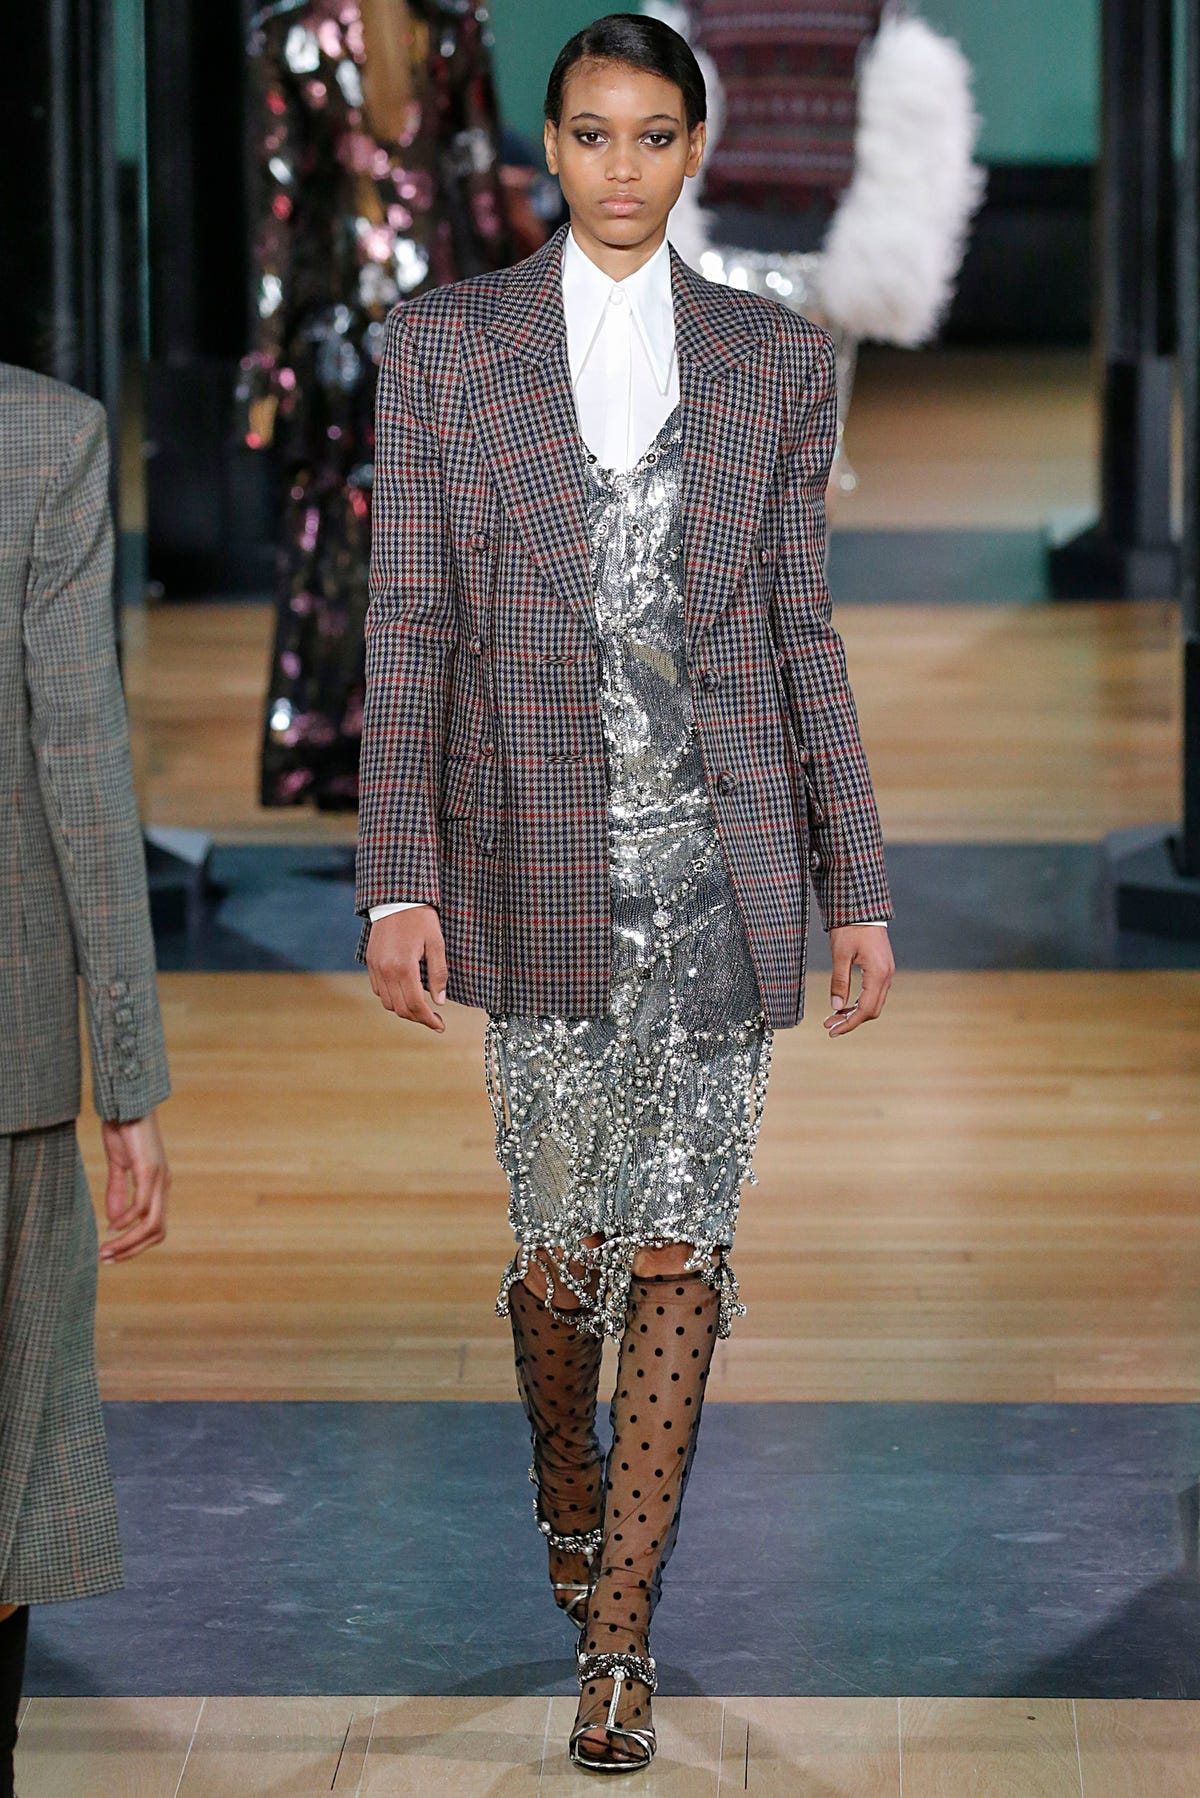 NYFW Trends Fall Winter 2018 Future Fast Fashion Styles